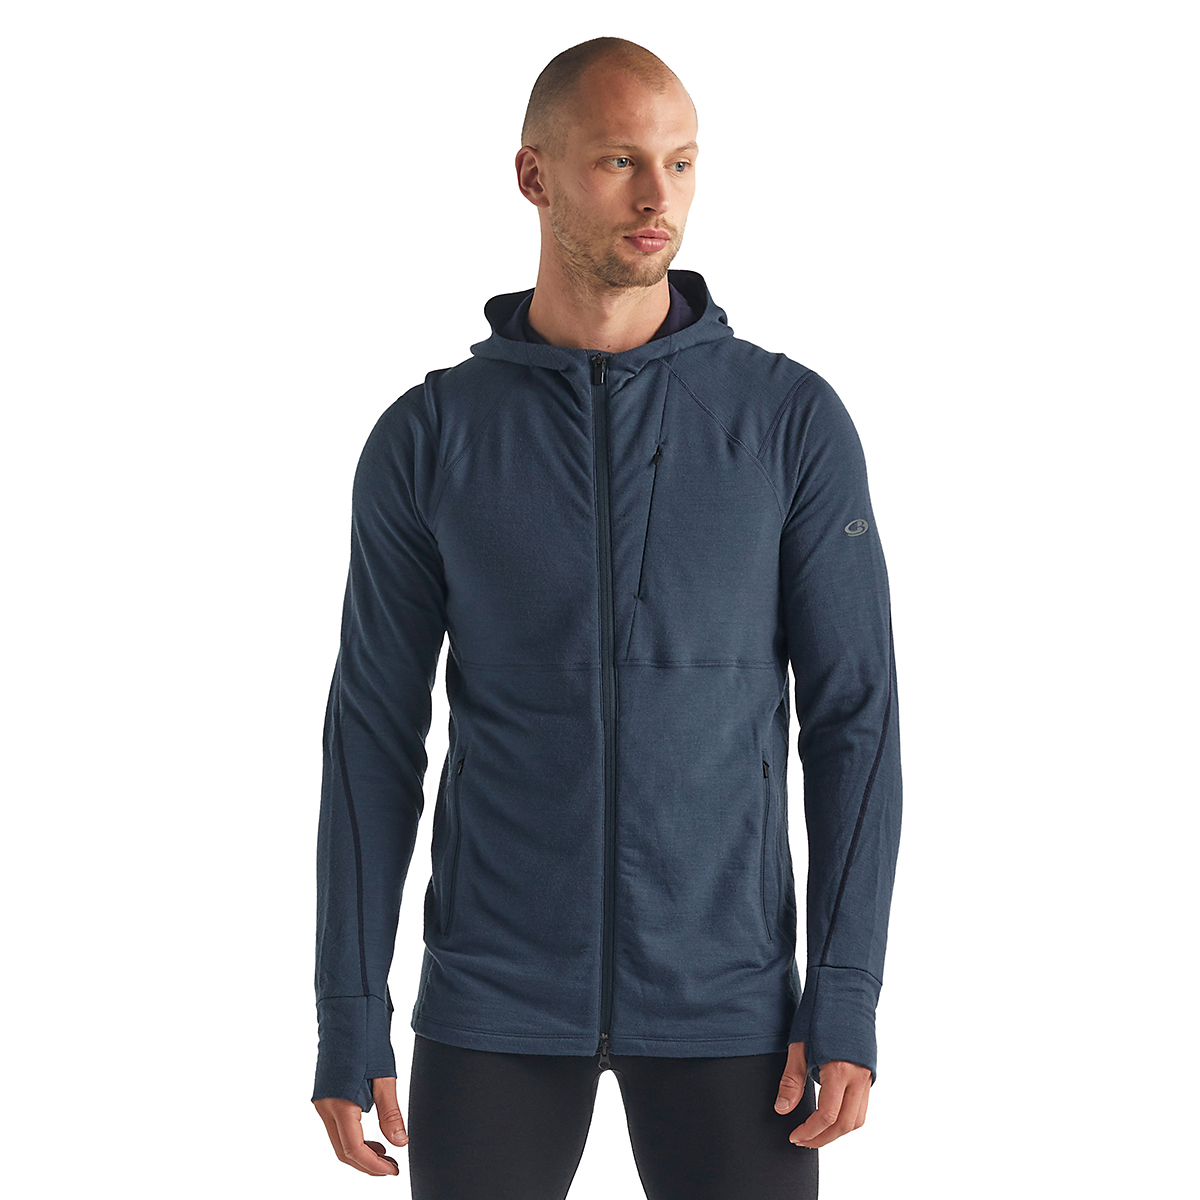 Men's Icebreaker Merino Quantum II Long Sleeve Zip Hood Jacket - Color: Serene Blue - Size: S, Serene Blue, large, image 1